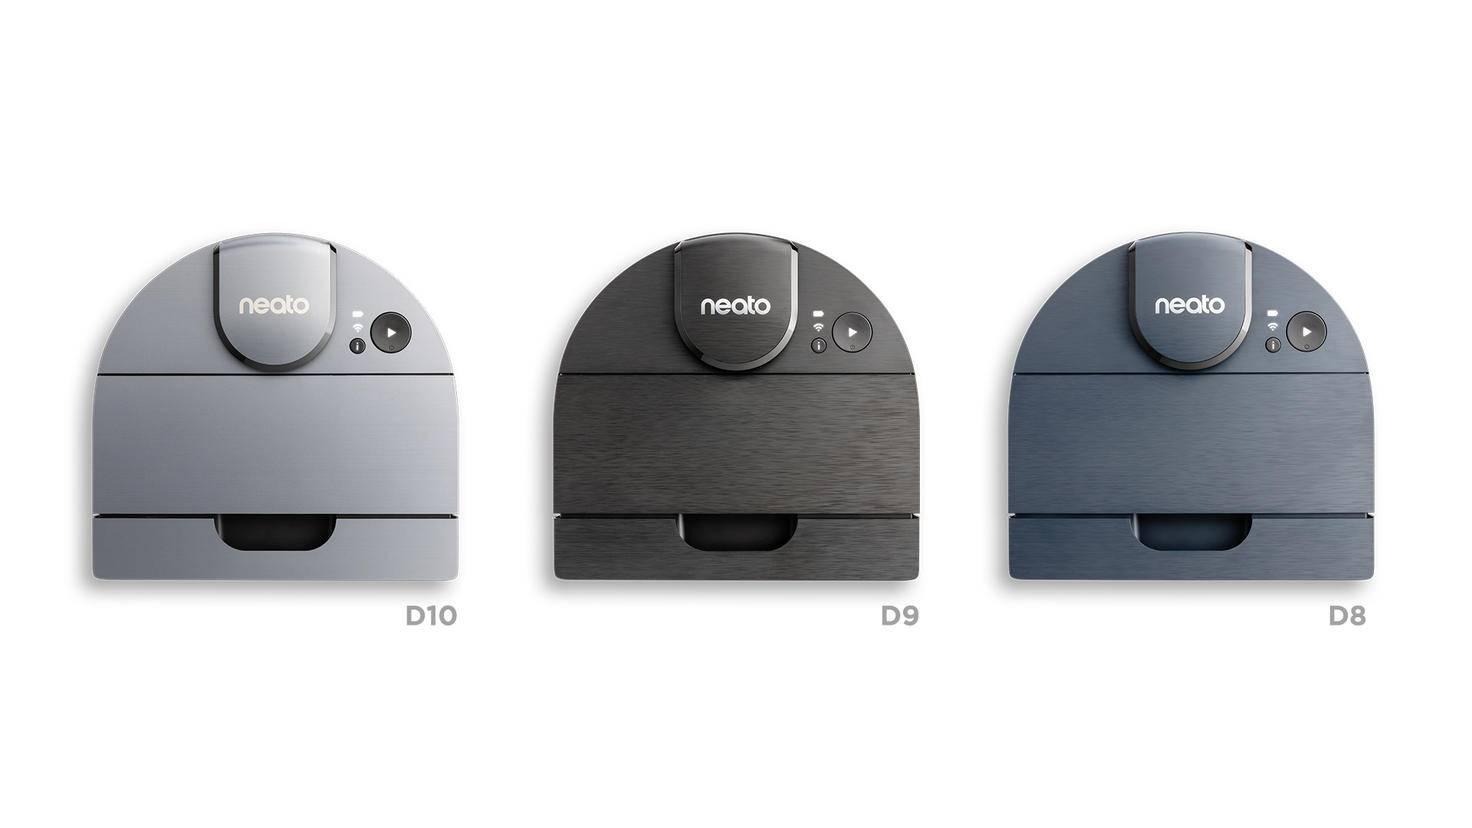 Neato-Intelligent-Robot-Vacuums